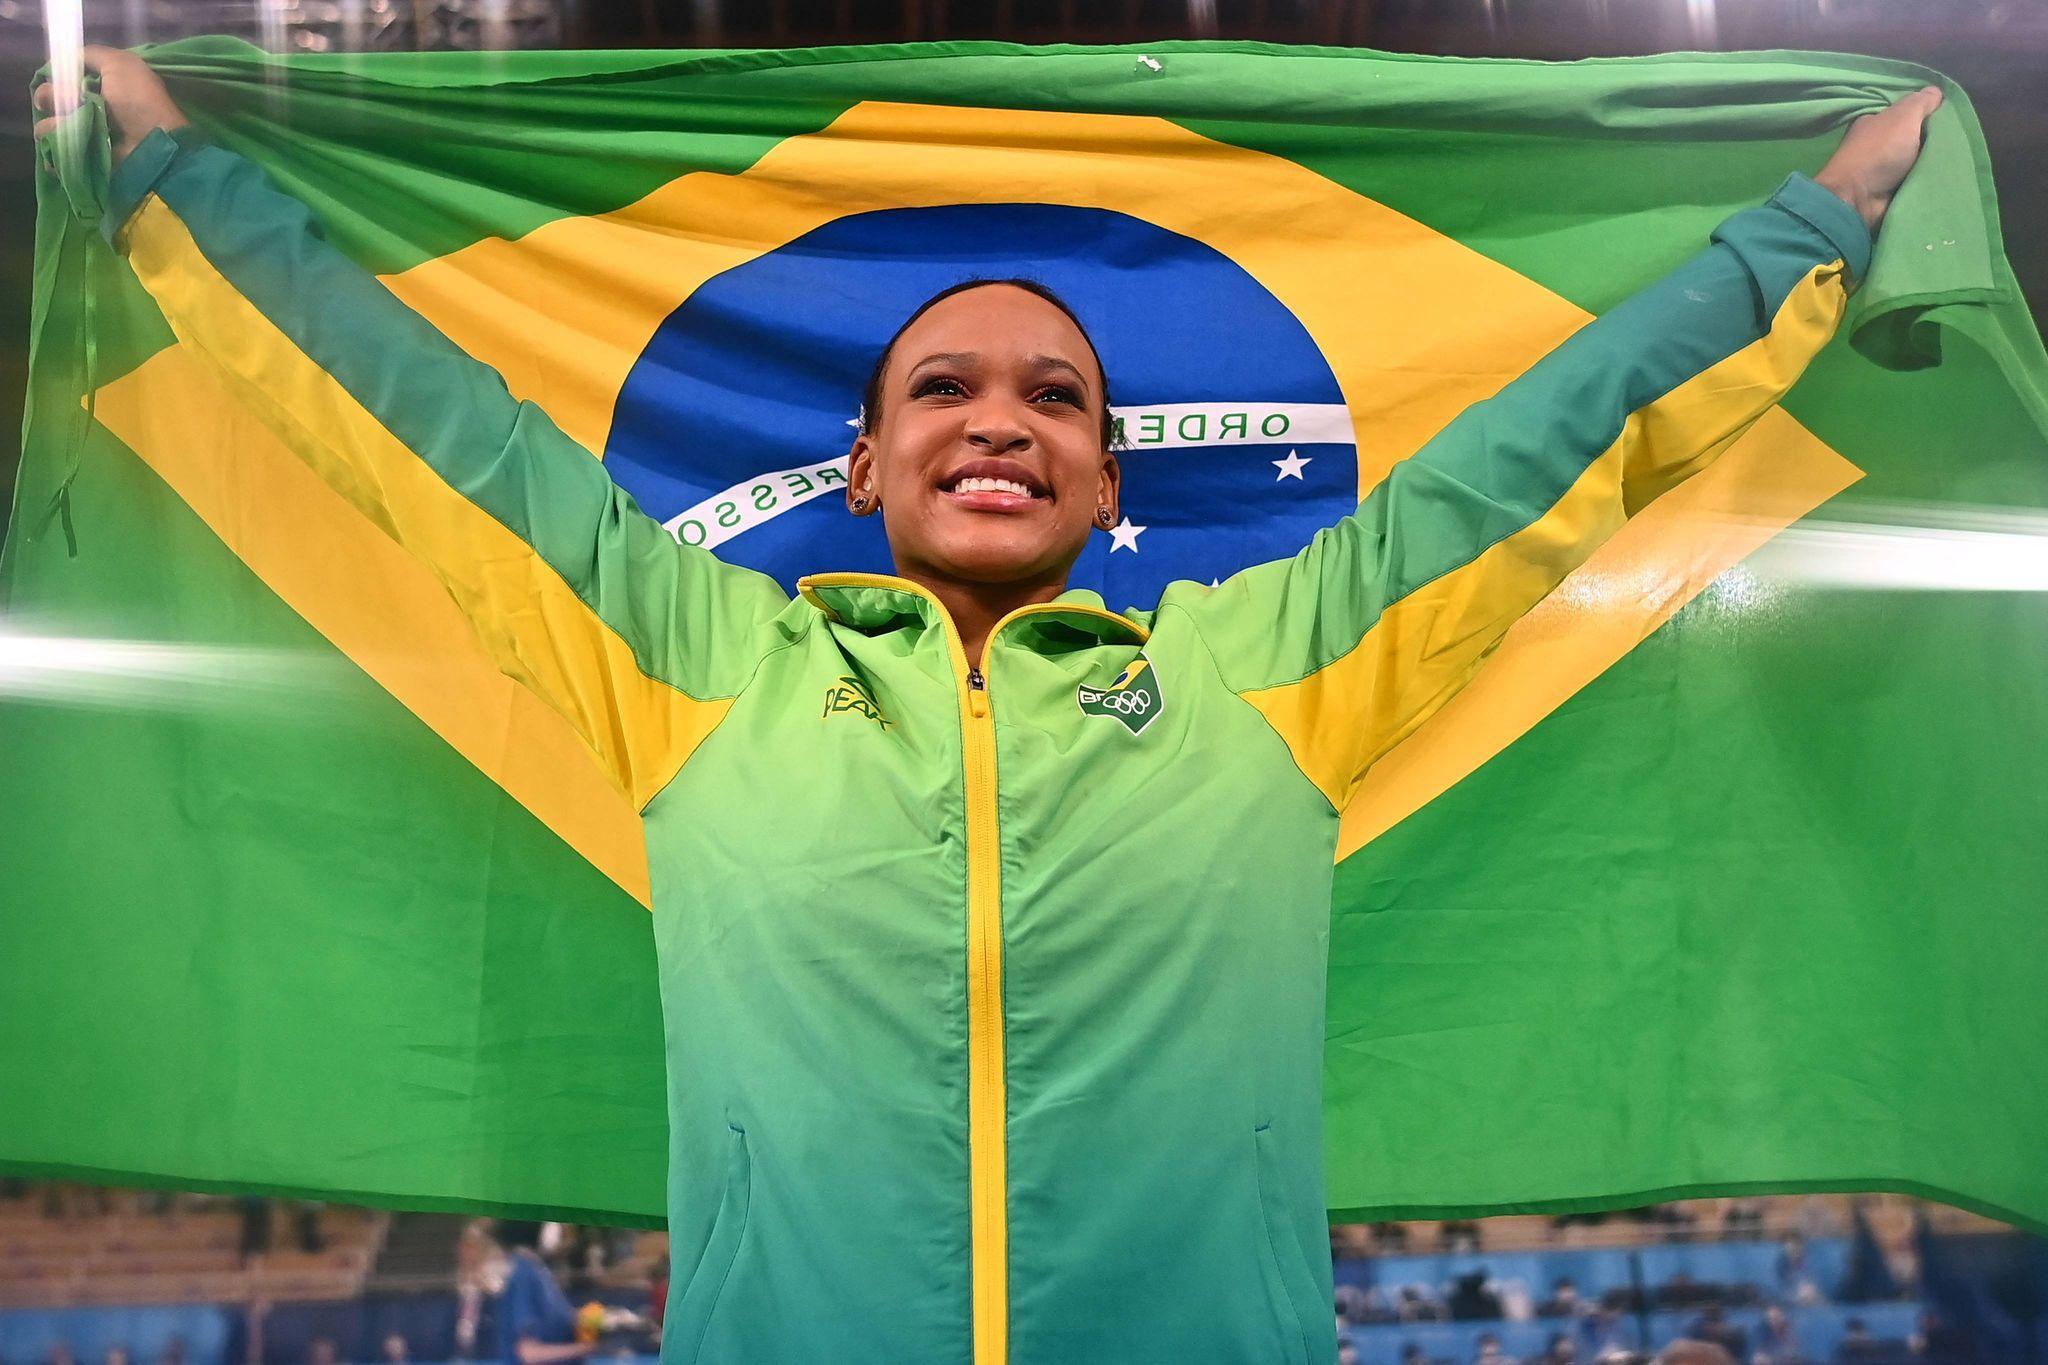 Rebeca Andrade exibe bandeira brasileira após conquistar o ouro